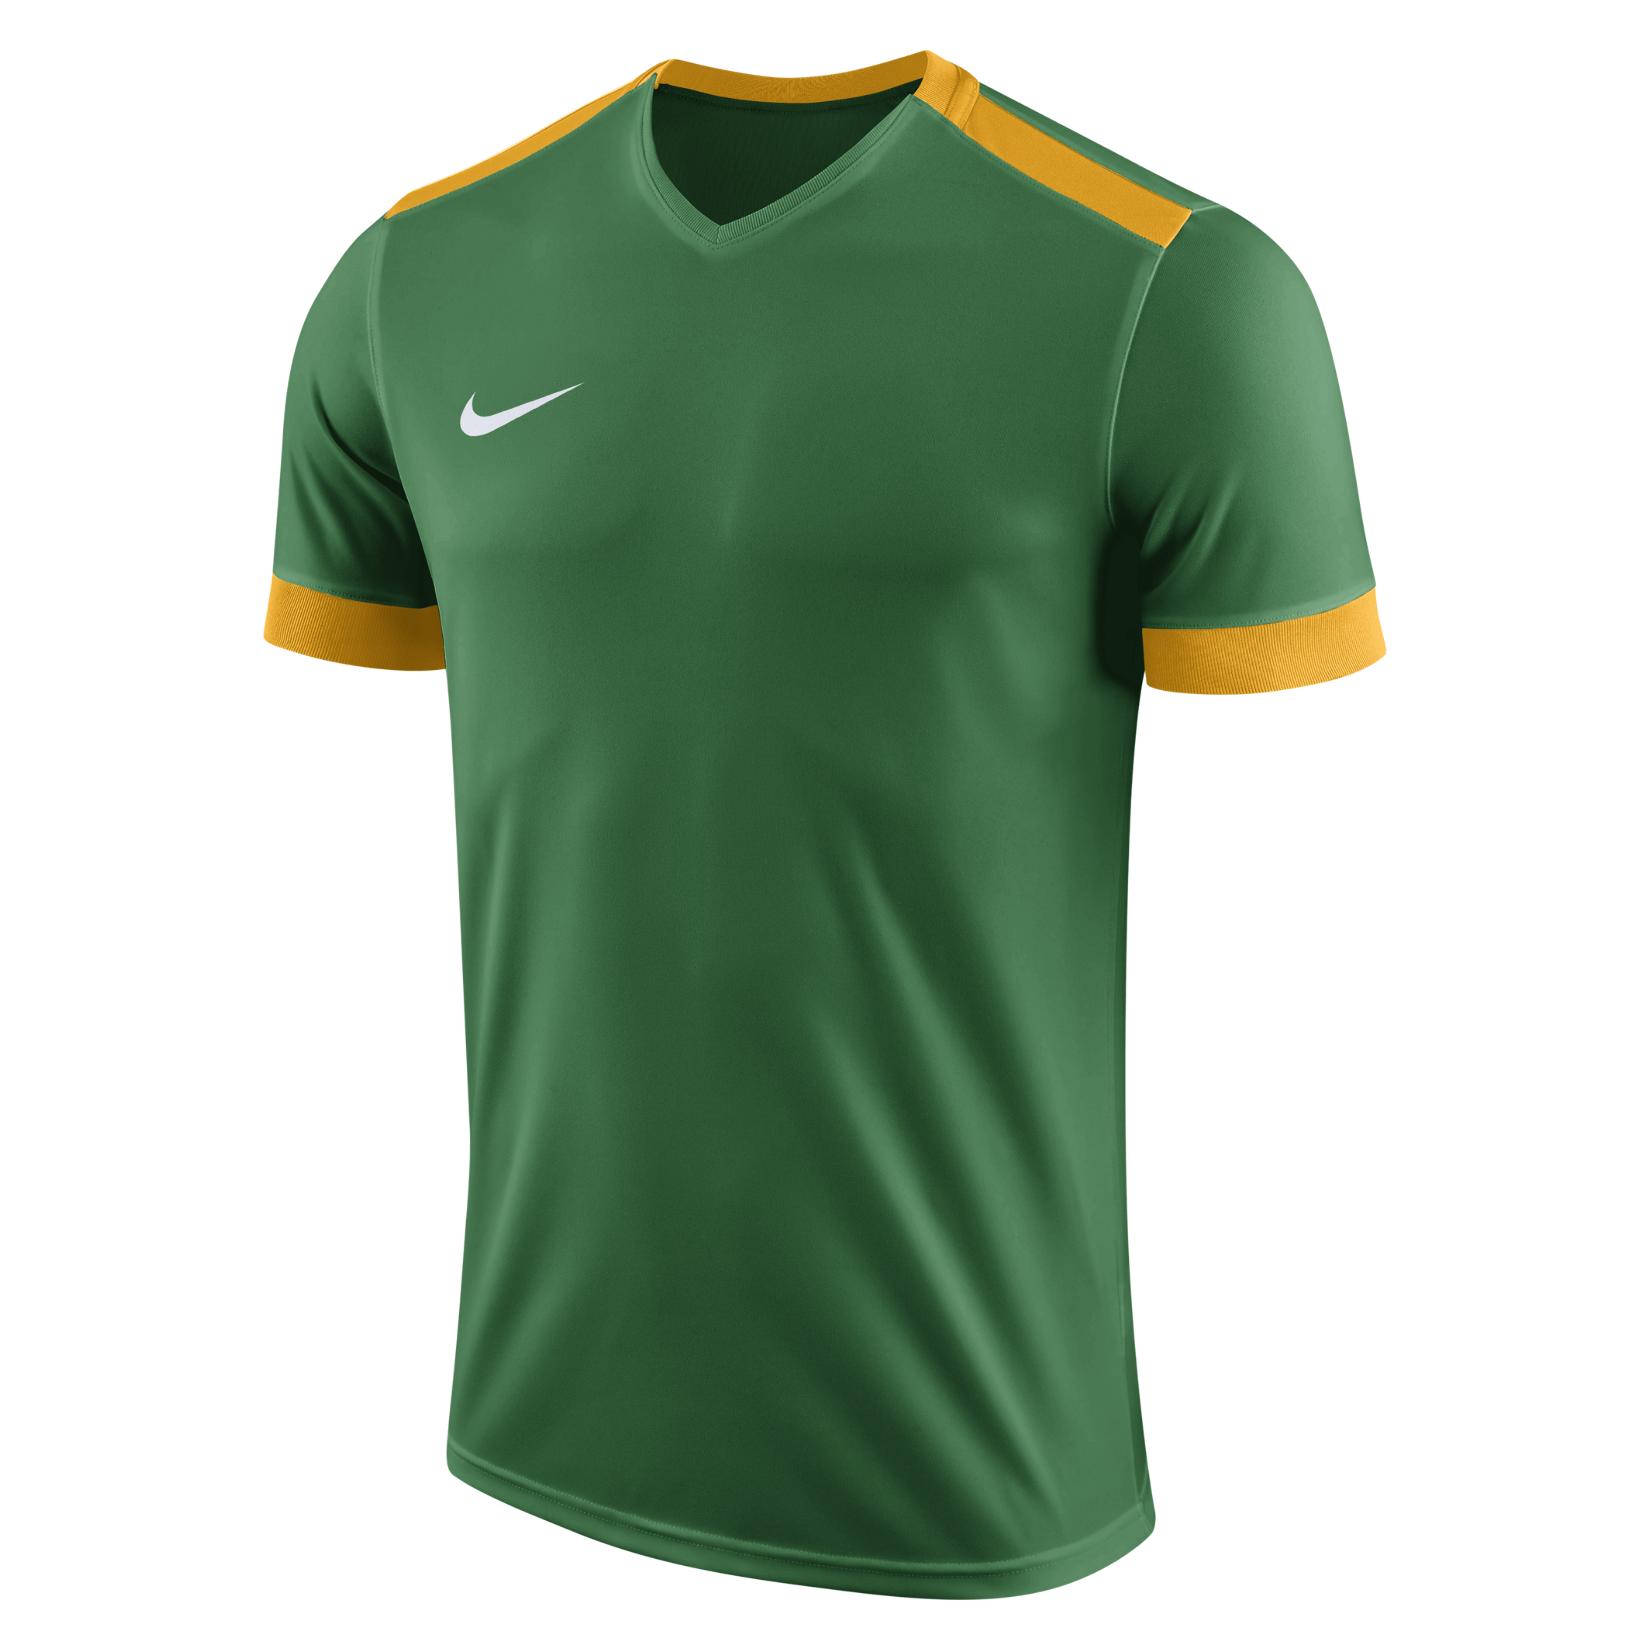 1bad6d76e98270 MN Sport - Koszulka Nike PARK DERBY II 894312 302 - Sklep piłkarski ...